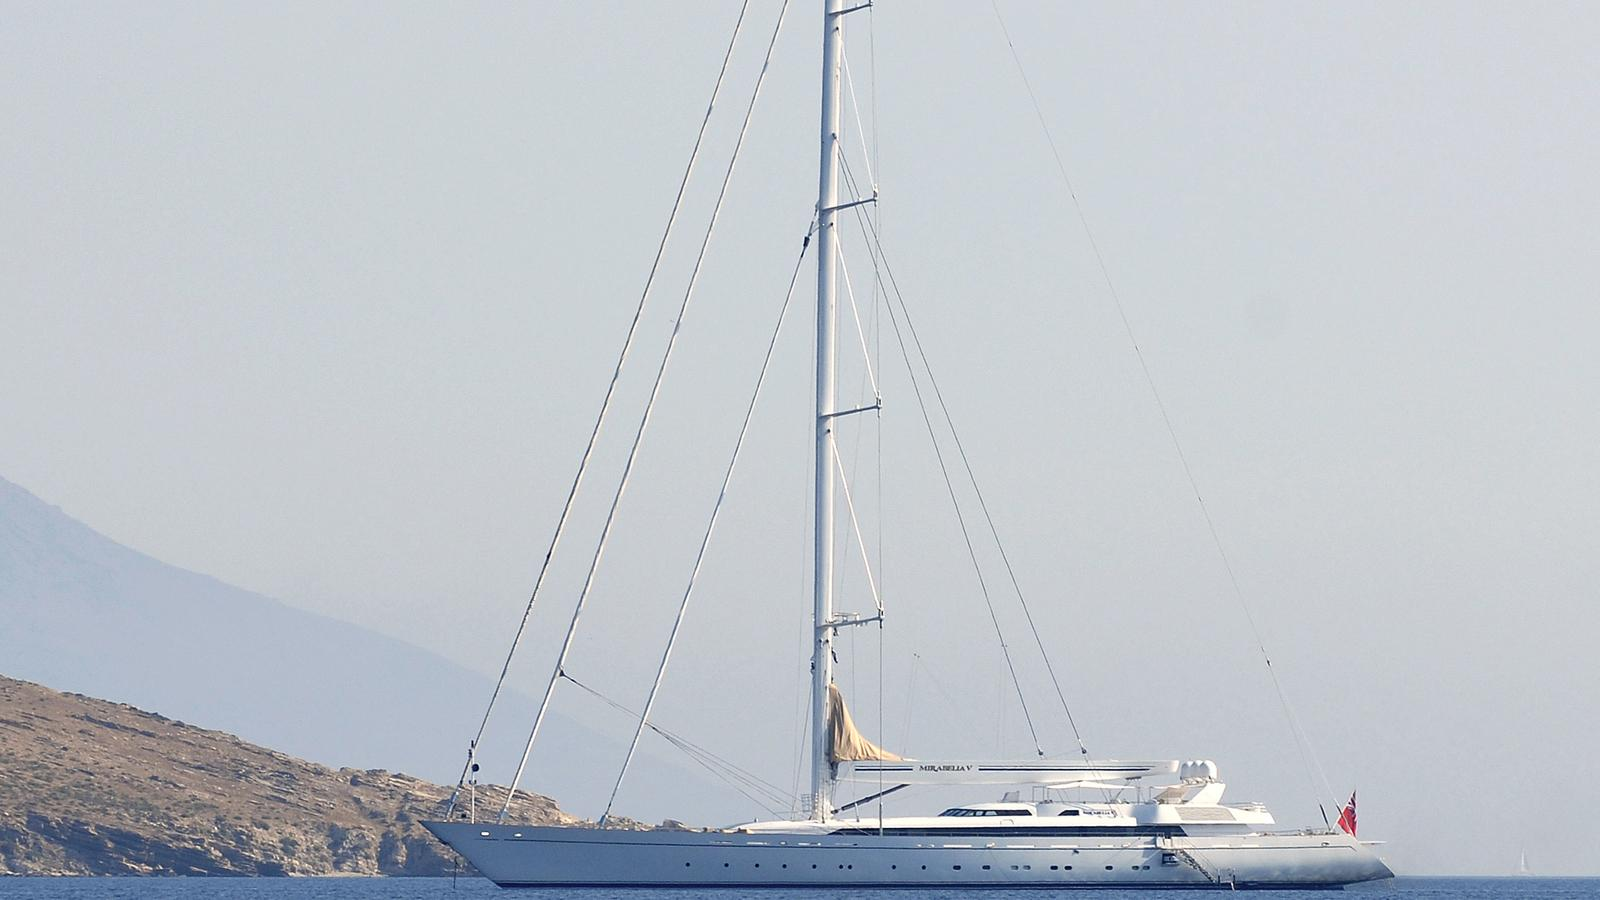 m5-super-yacht-sailing-boat